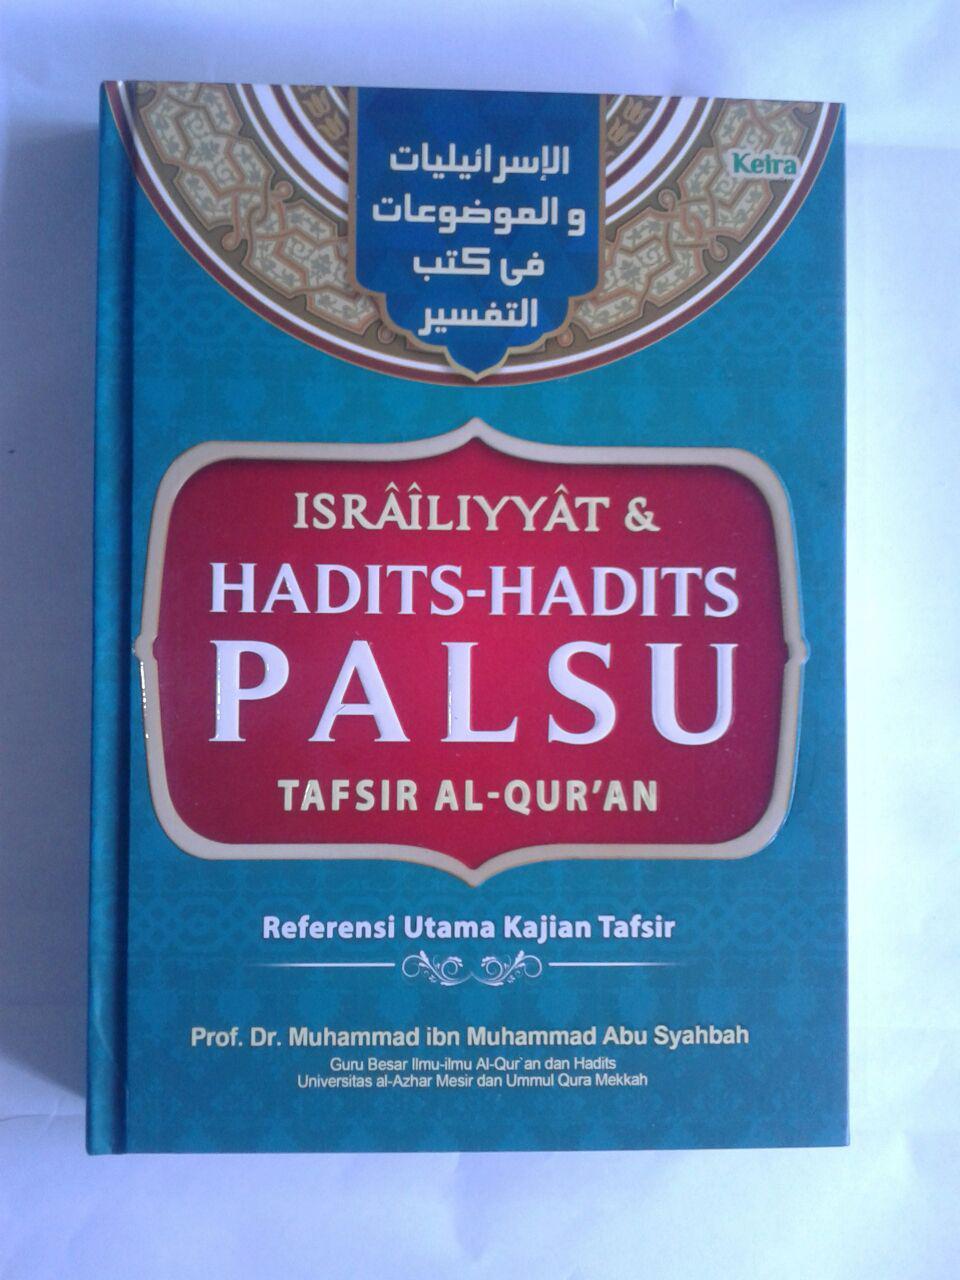 Buku Israiliyyat Dan Hadits-Hadits Palsu Tafsir Al-Qur'an cover 2